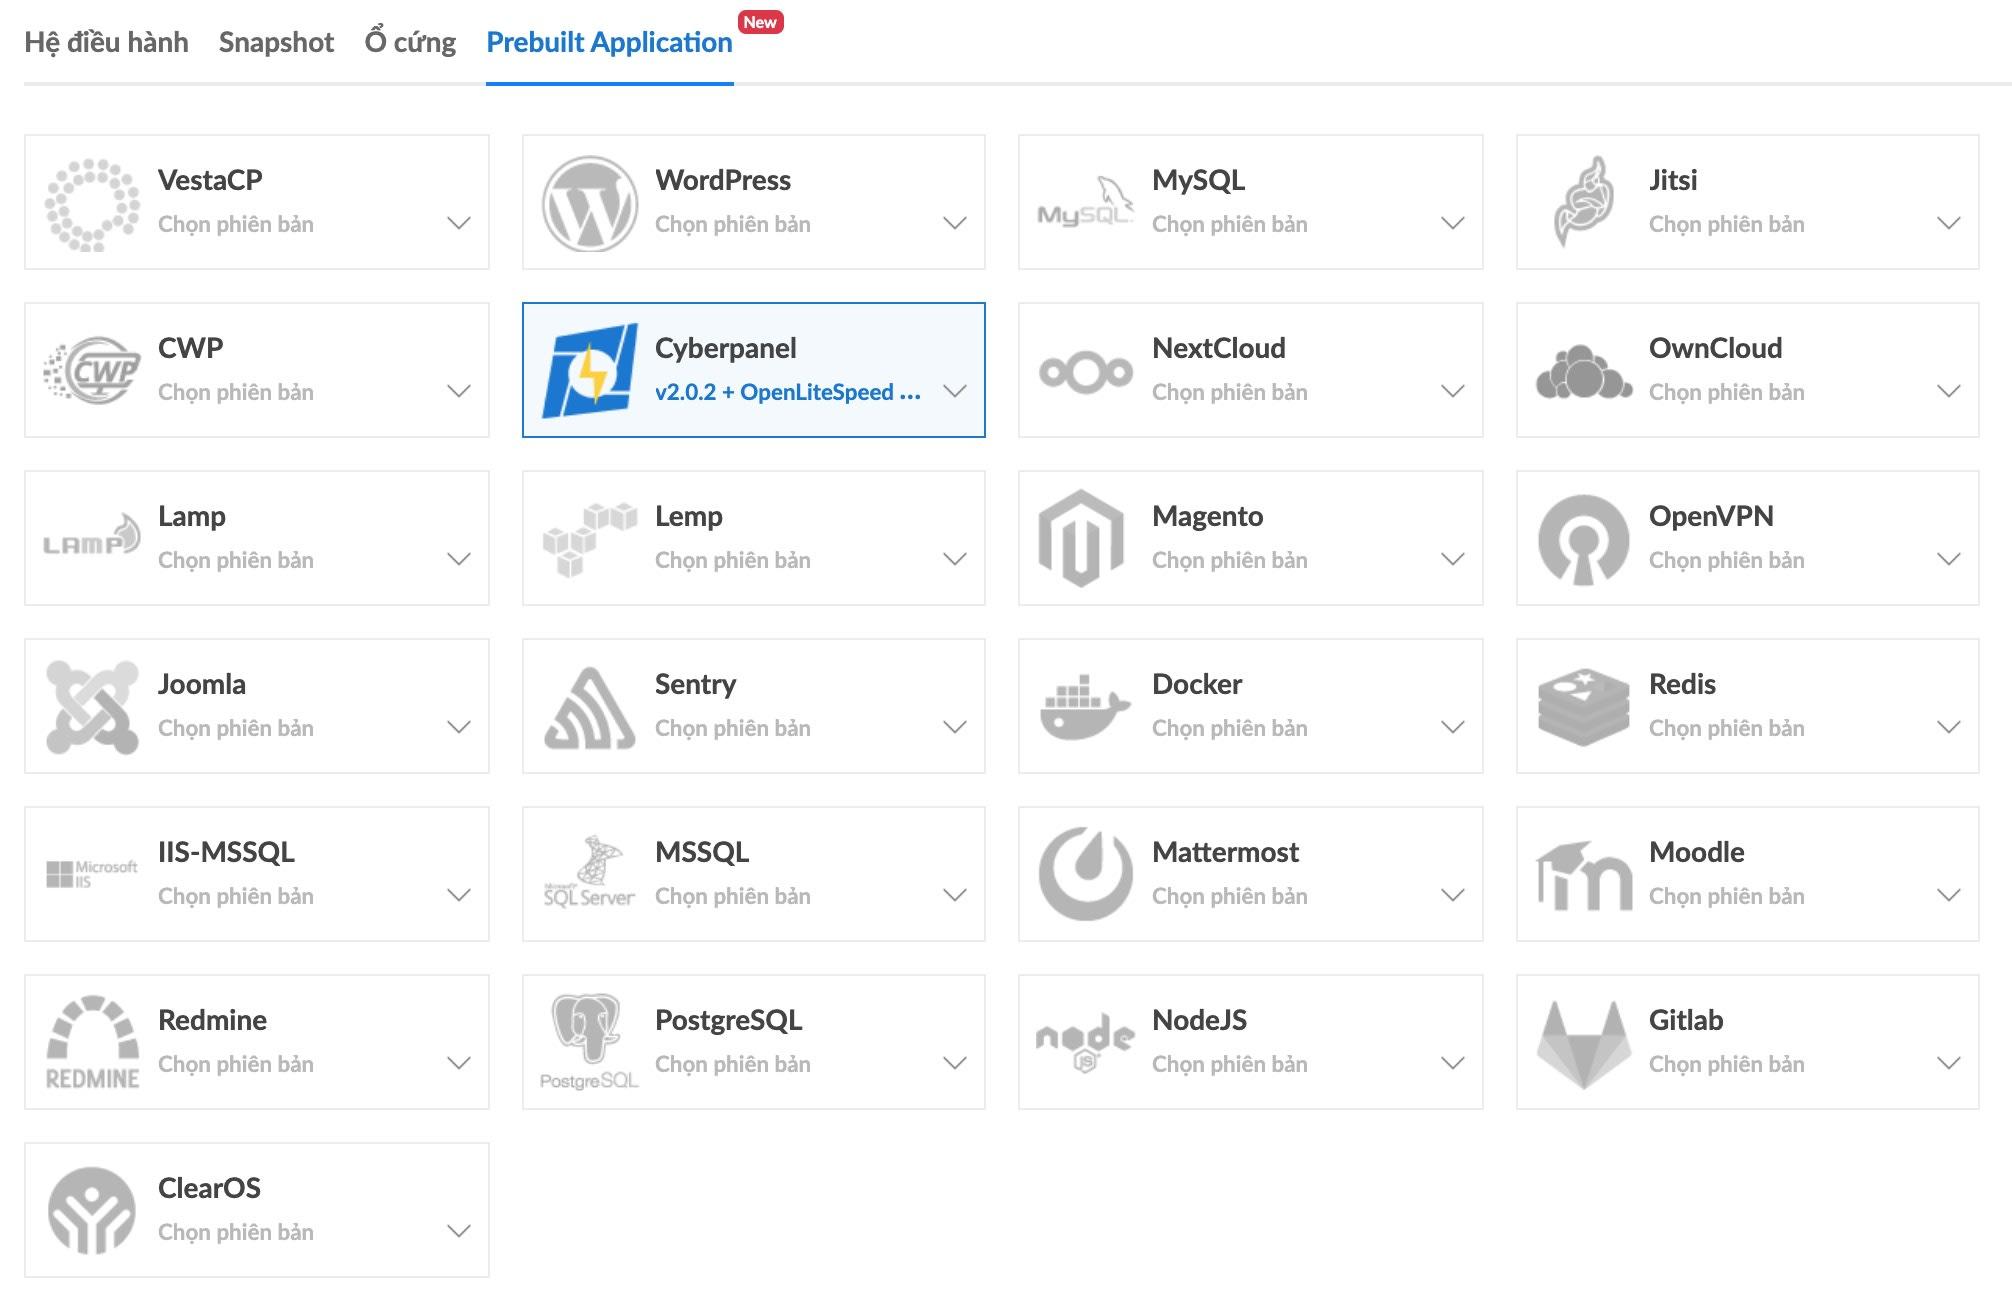 bizfly prebuilt app new